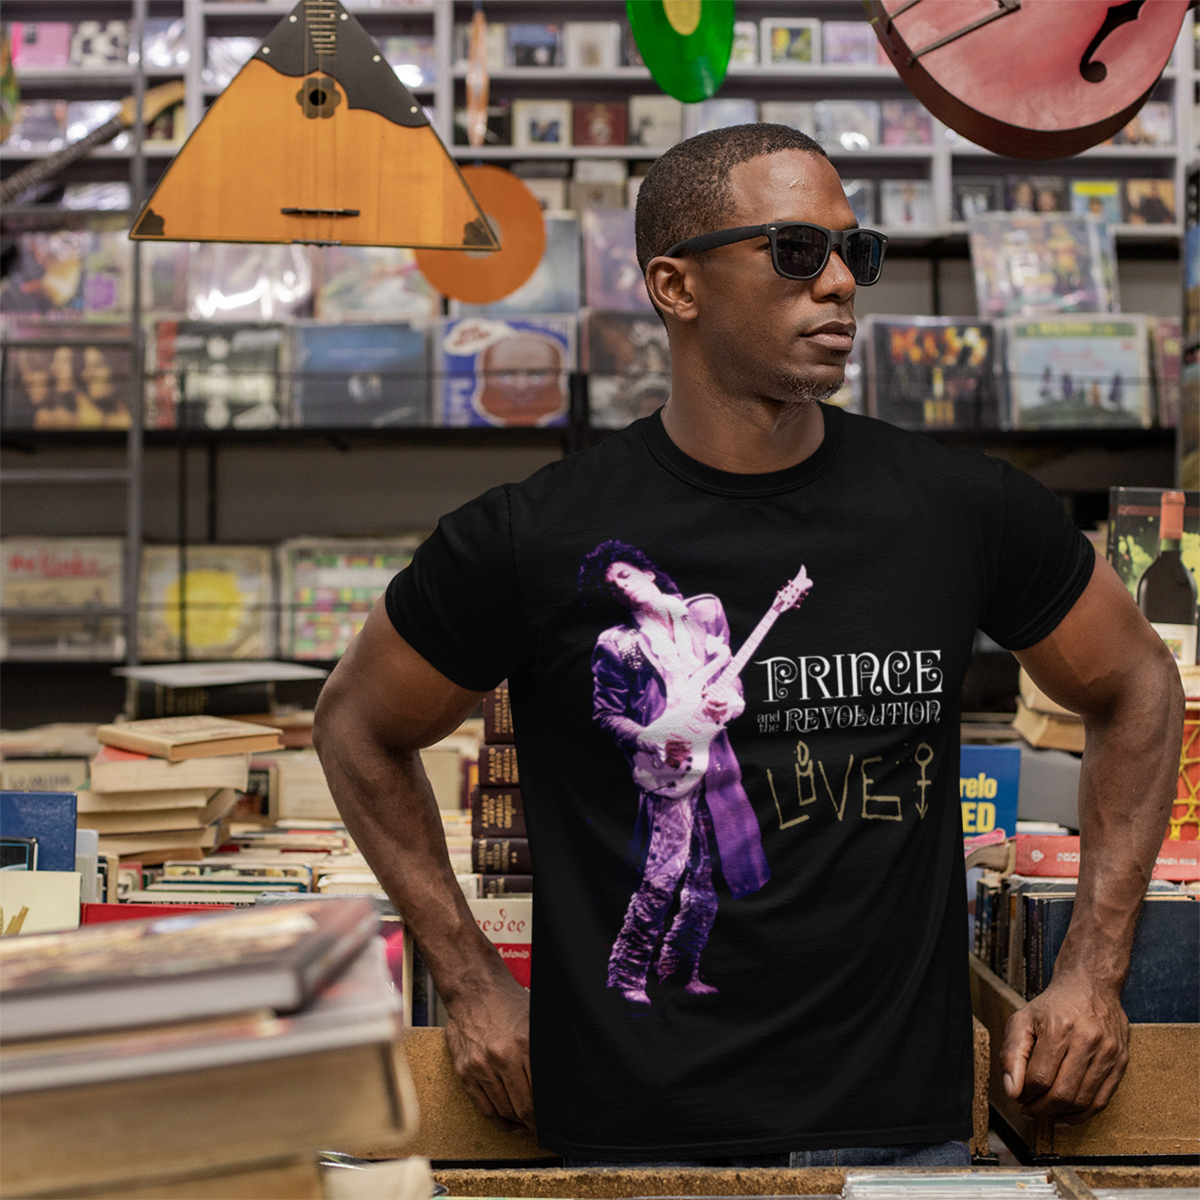 Prince & The Revolution - Live (Tour T-shirt)